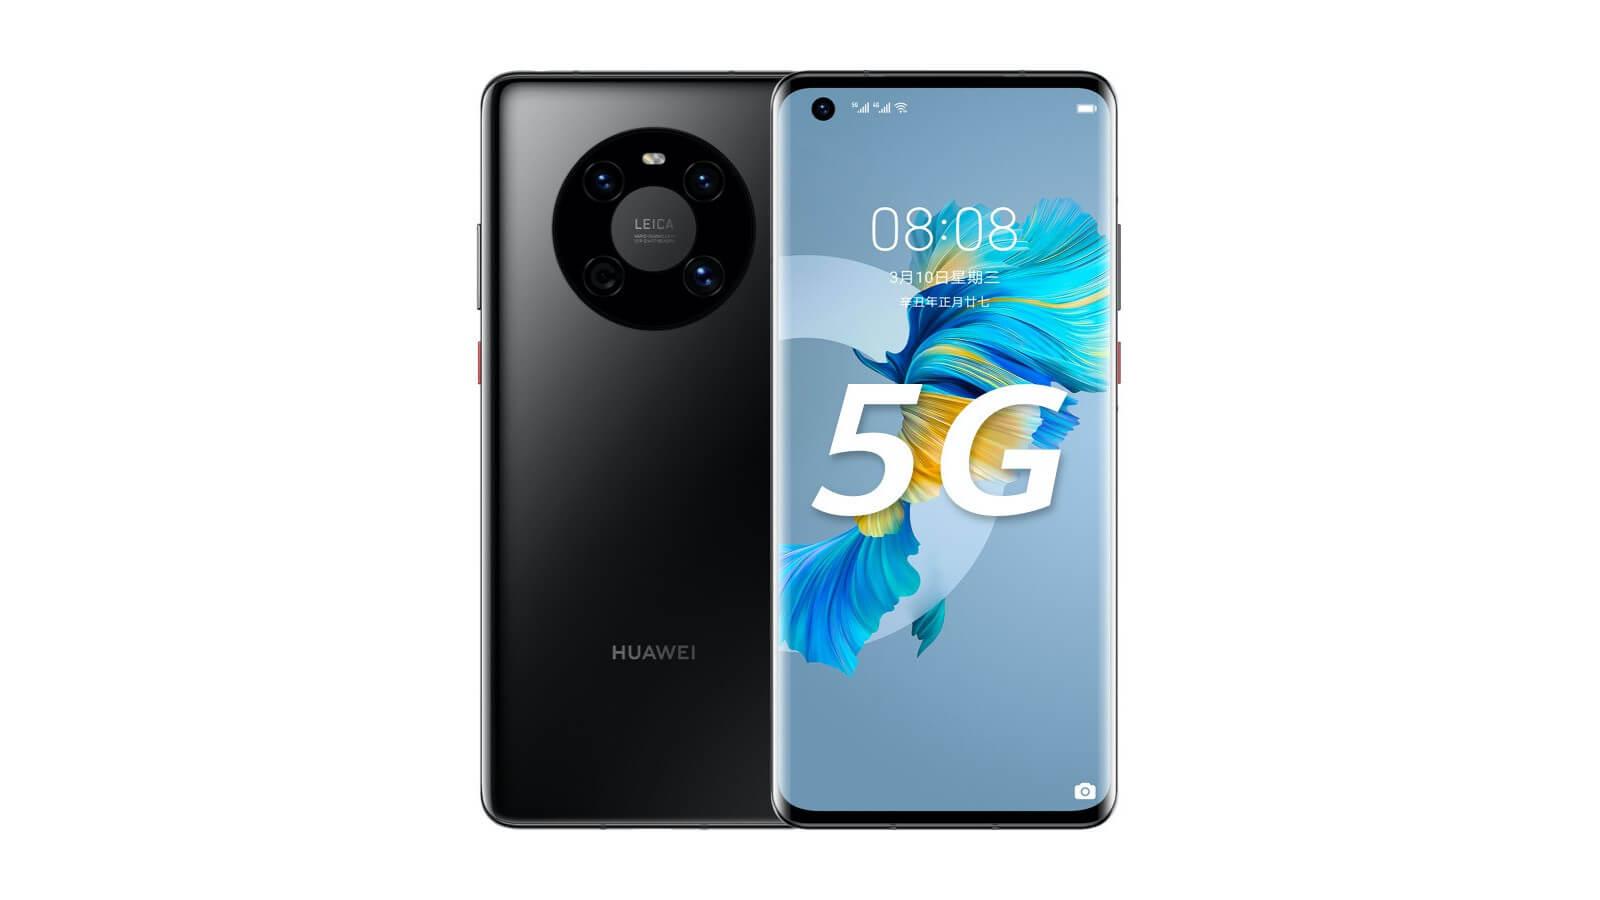 Huawei Mate 40E: дисплей 90 Гц, быстрая зарядка и 64-Мп камера